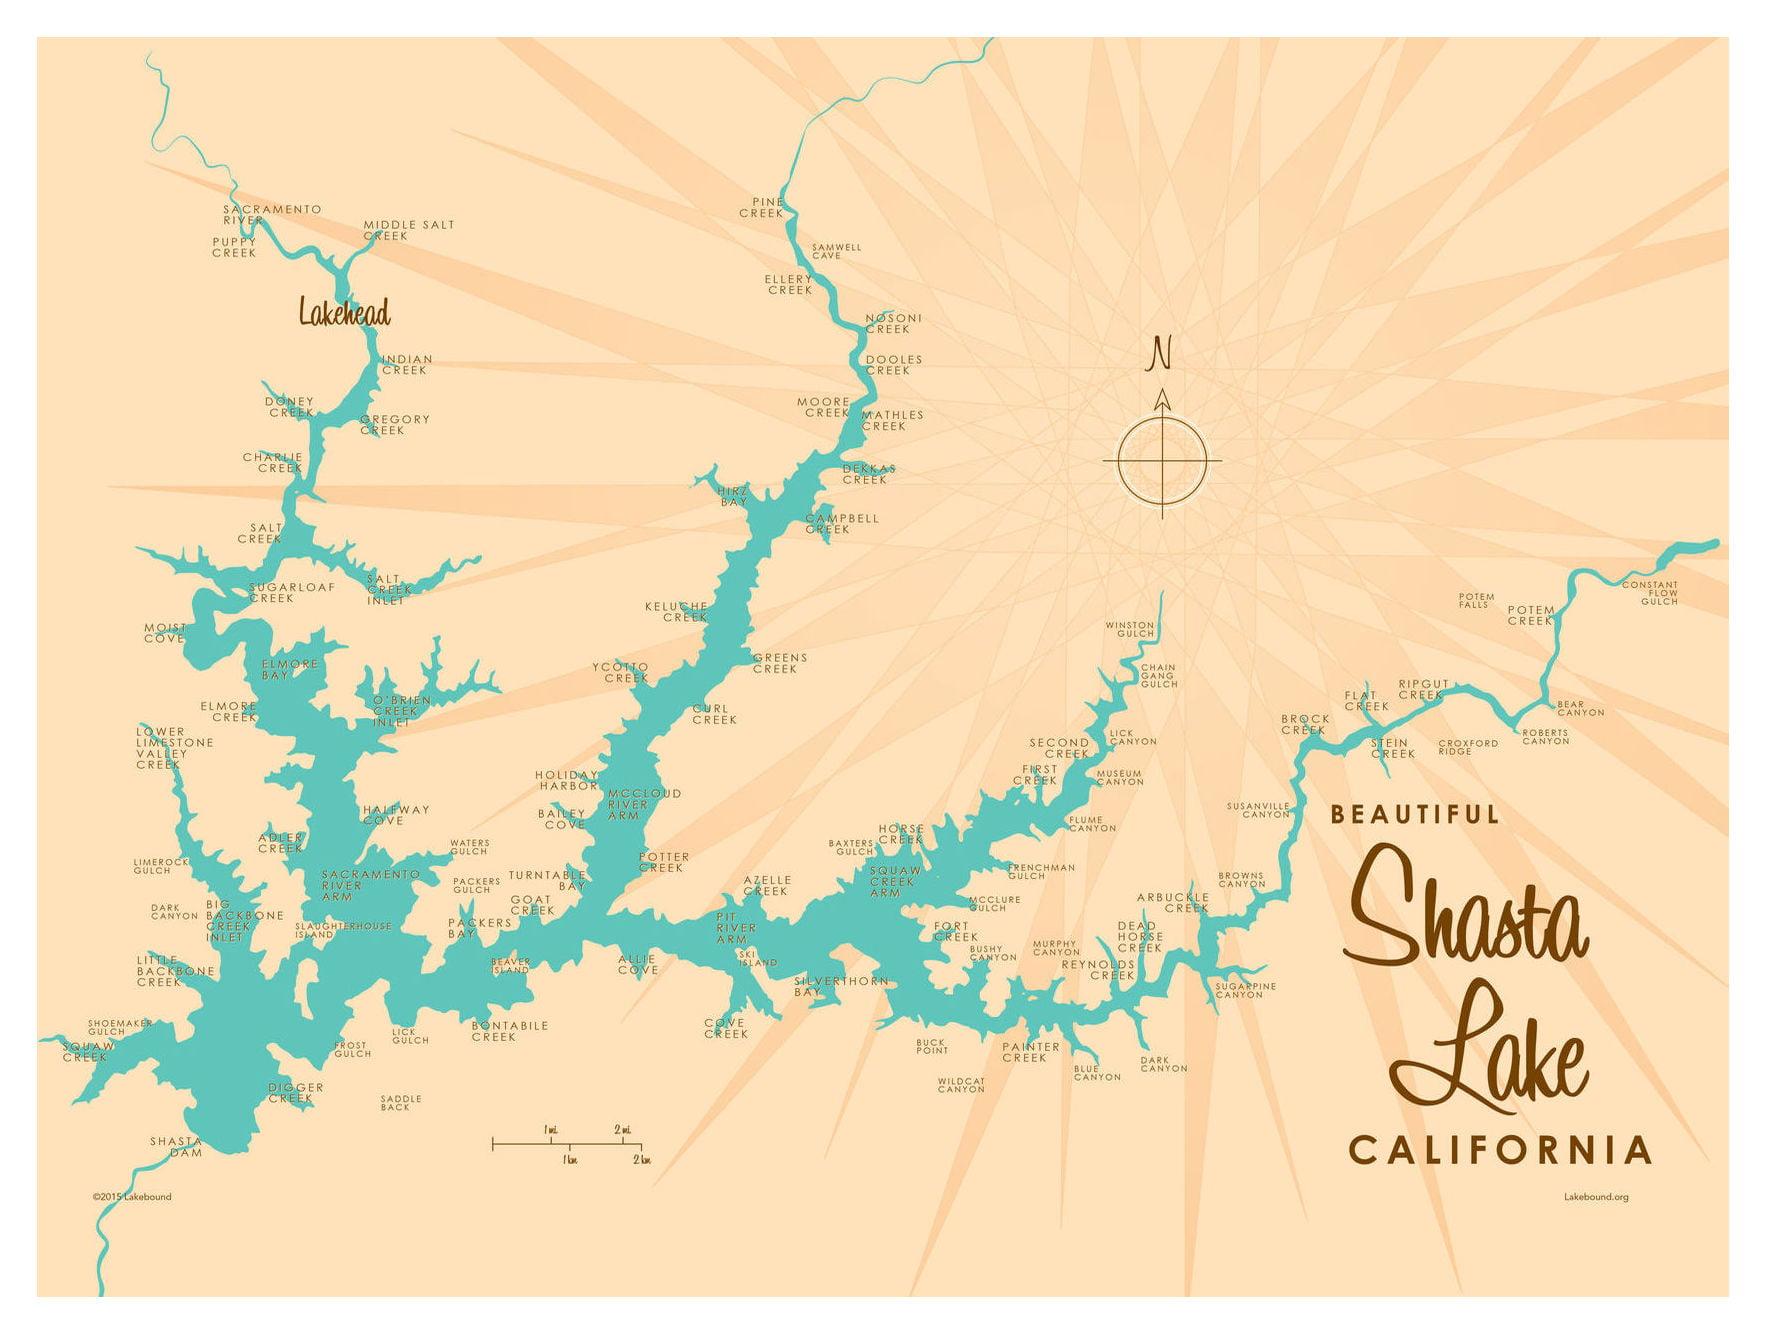 Shasta Lake California Map Vintage Style Art Print By Lakebound 30